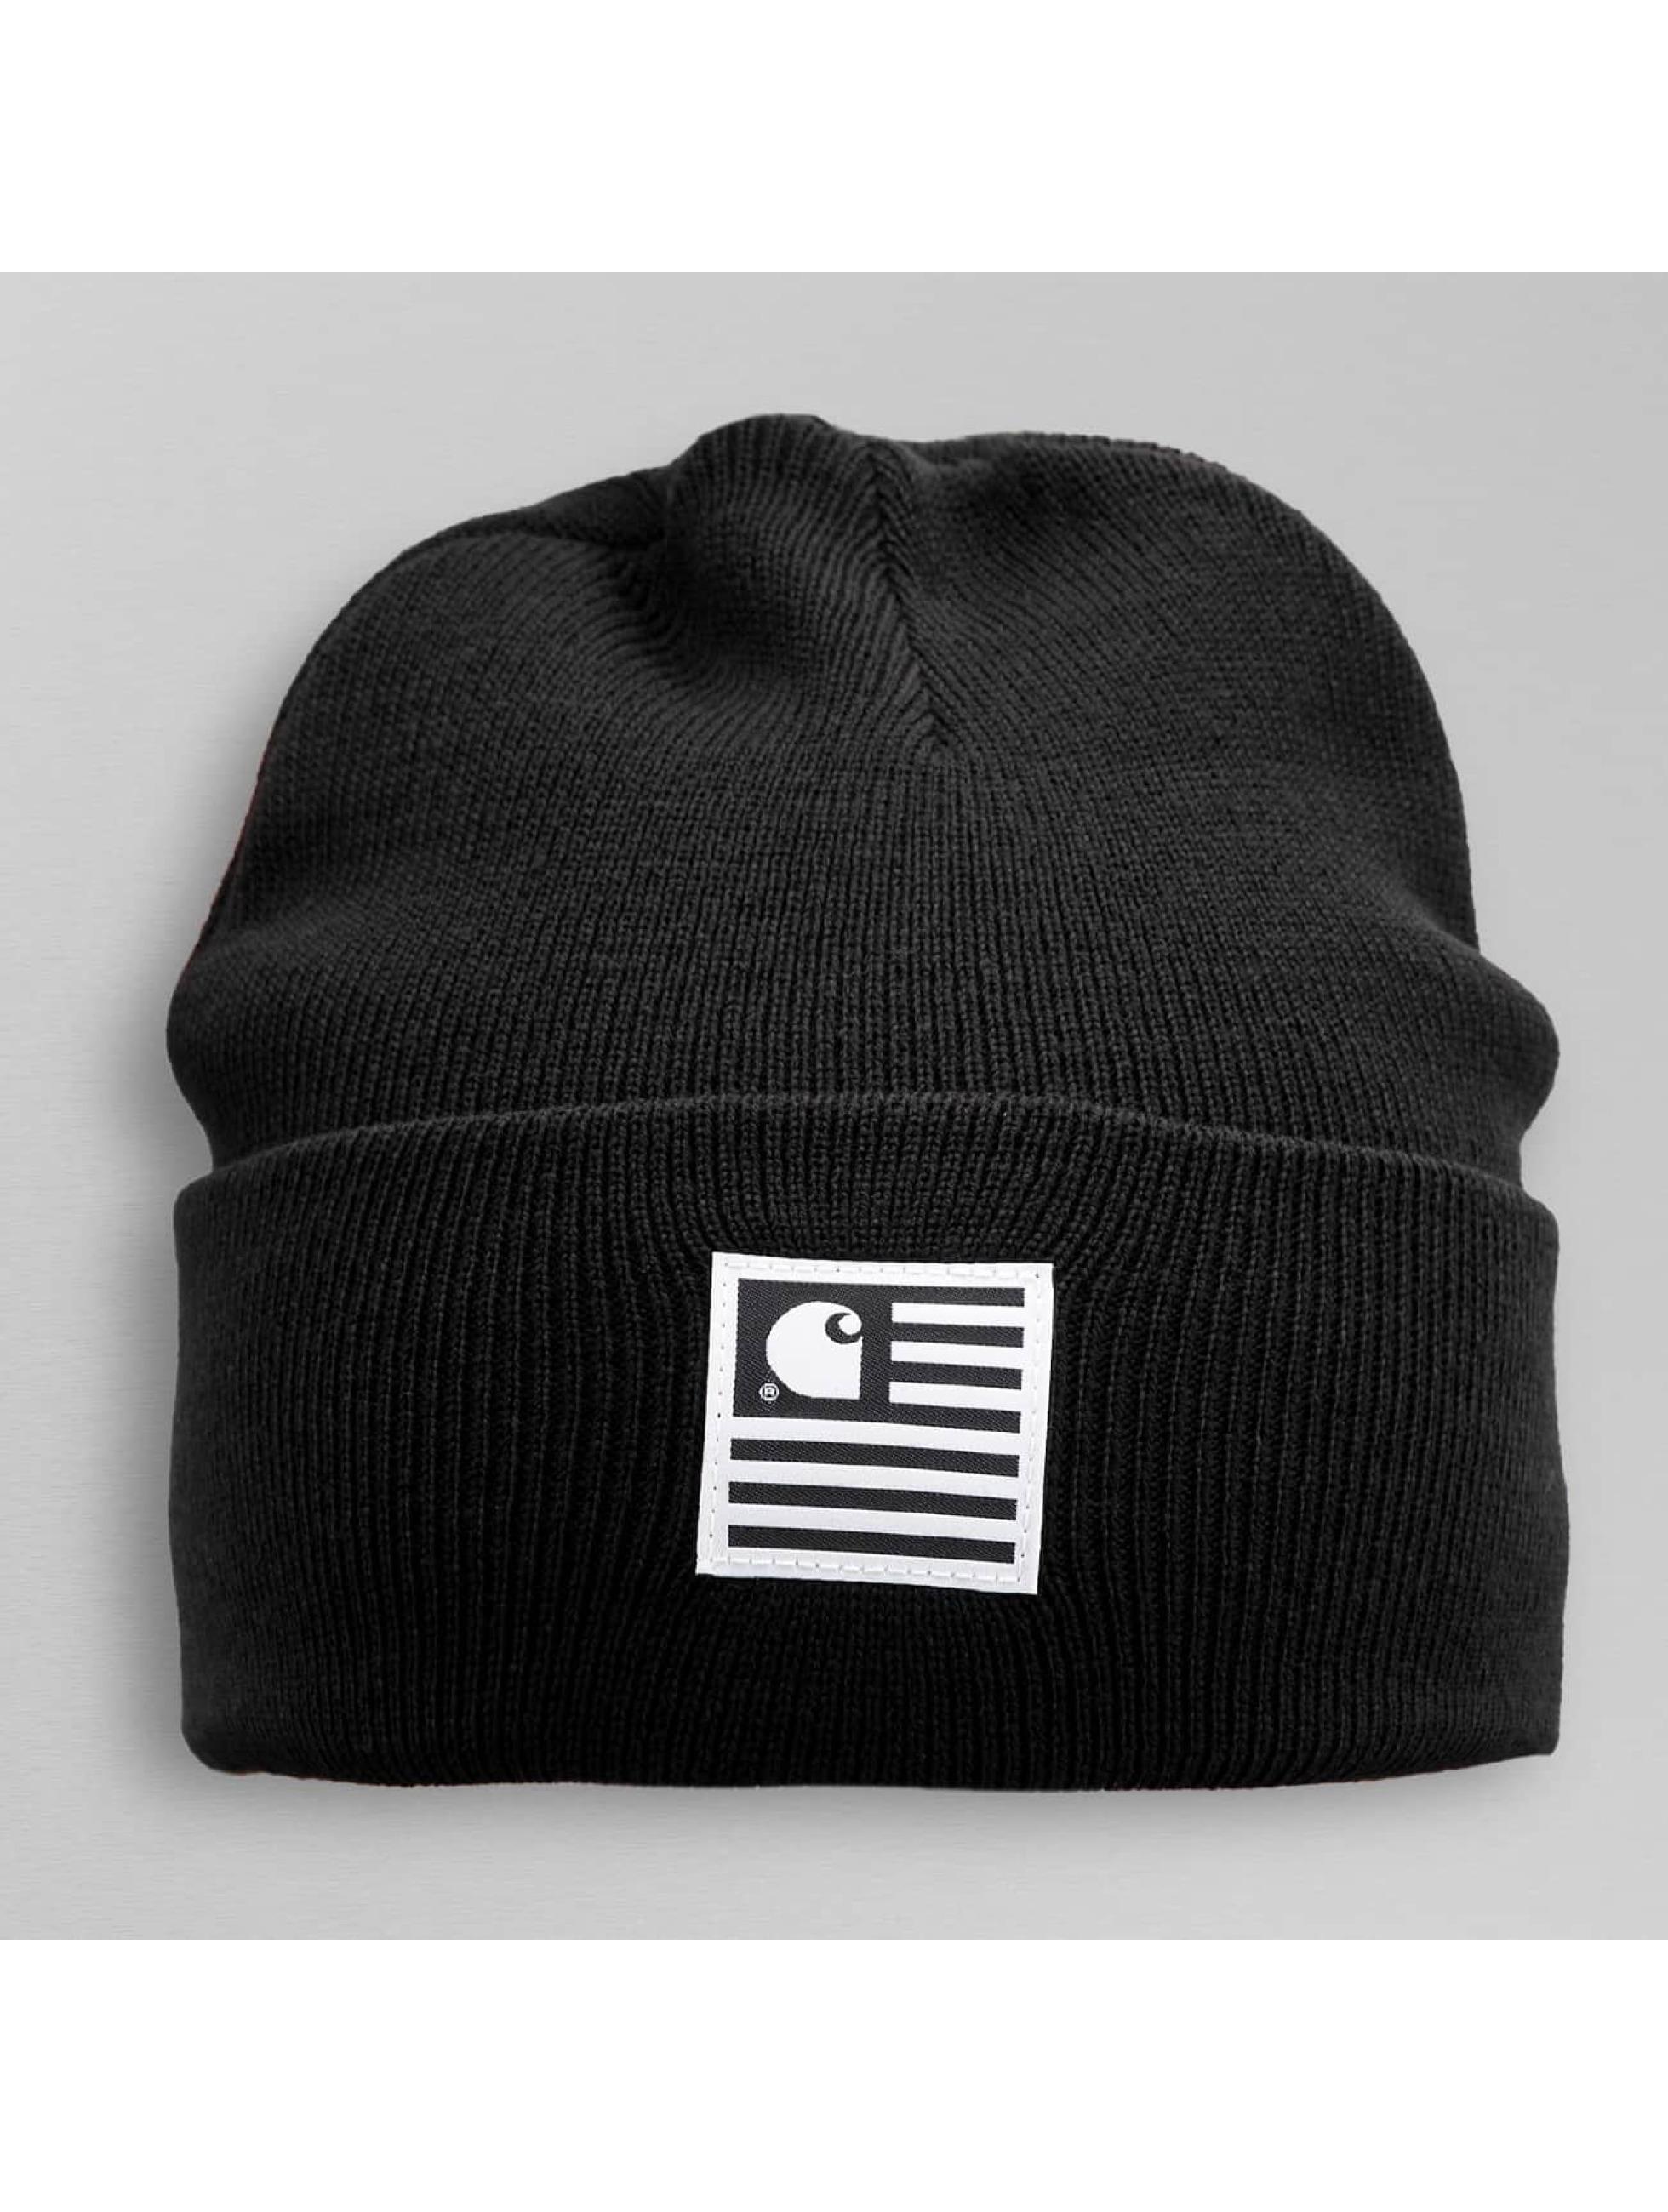 carhartt wip accessoires bonnet state en noir 268562. Black Bedroom Furniture Sets. Home Design Ideas